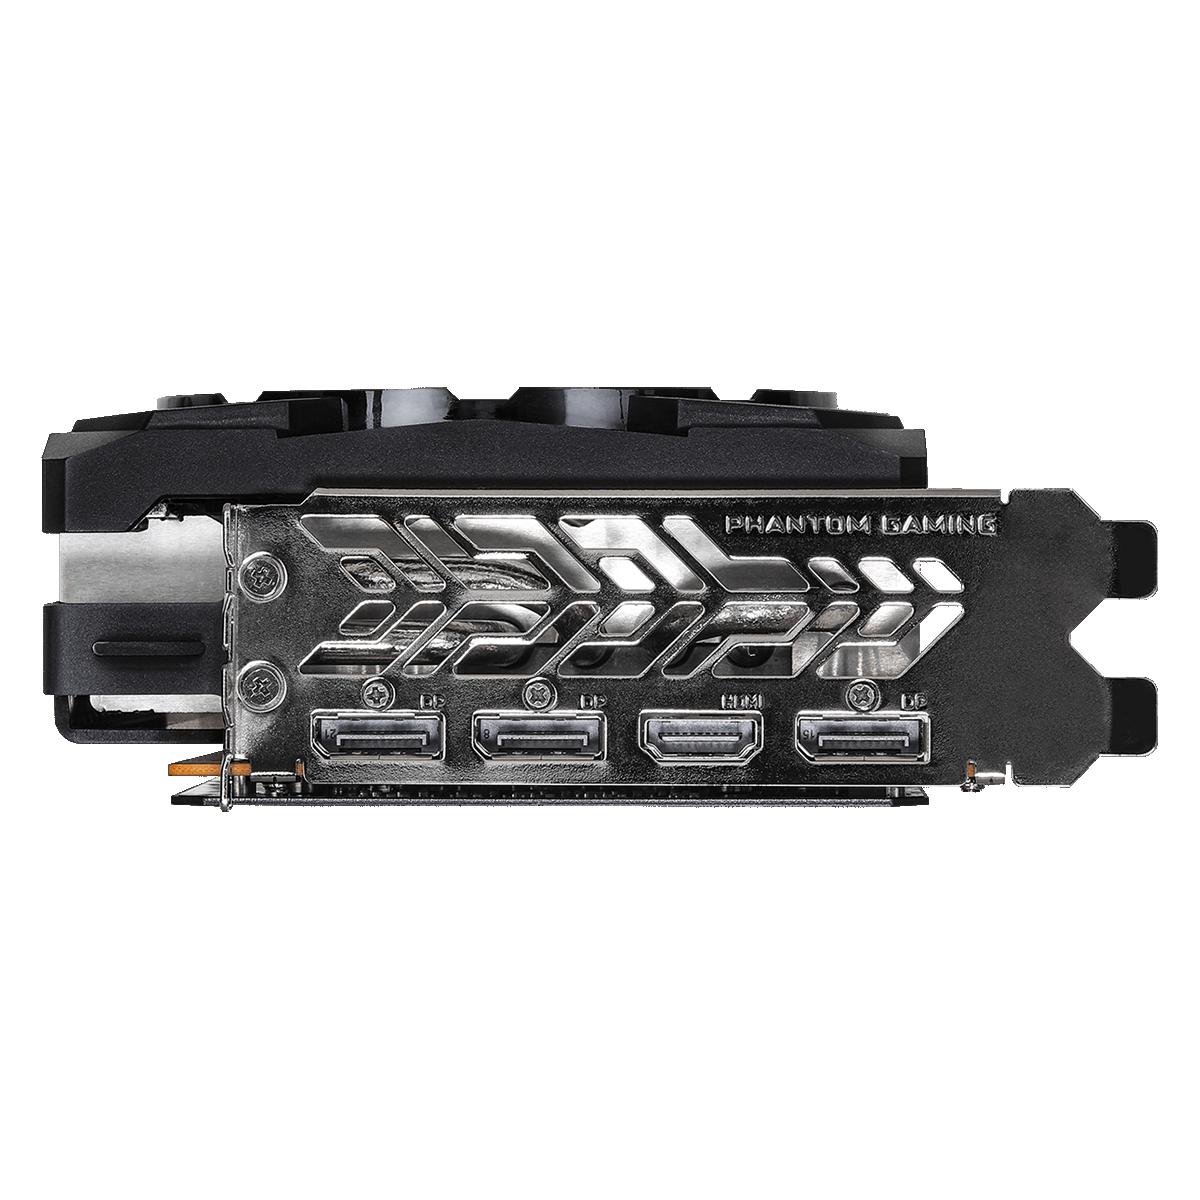 Placa de Vïdeo ASRock Radeon RX 6700 XT Phantom Gaming D OC, 12GB, GDDR6, FSR, Ray Tracing, 90-GA2EZZ-00UANF